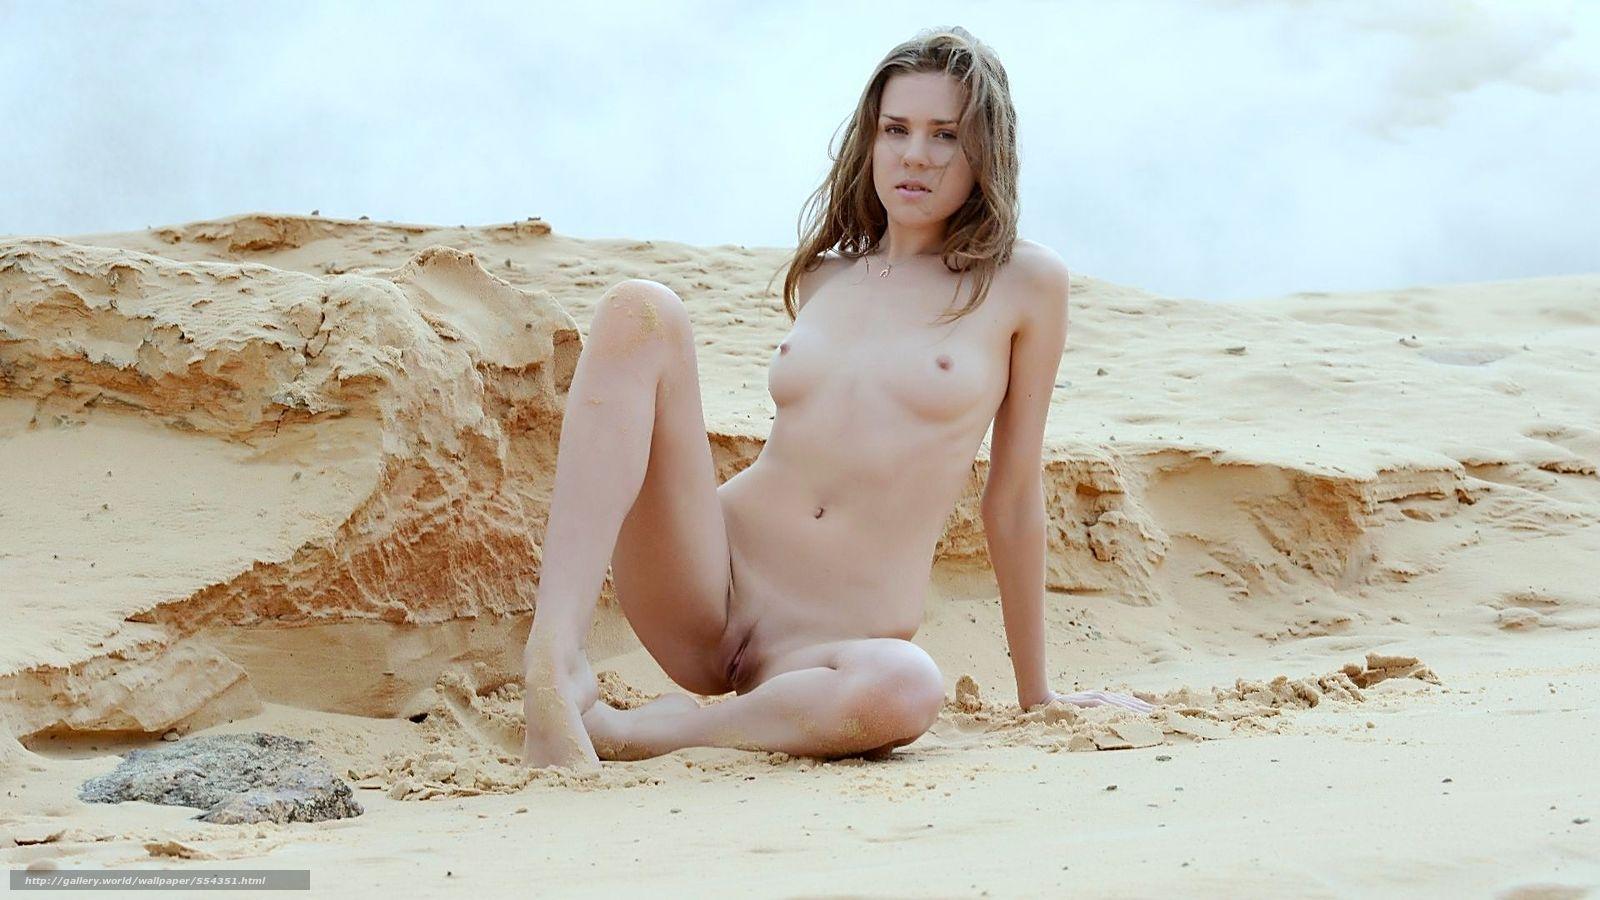 Namoi knight nude nude photos